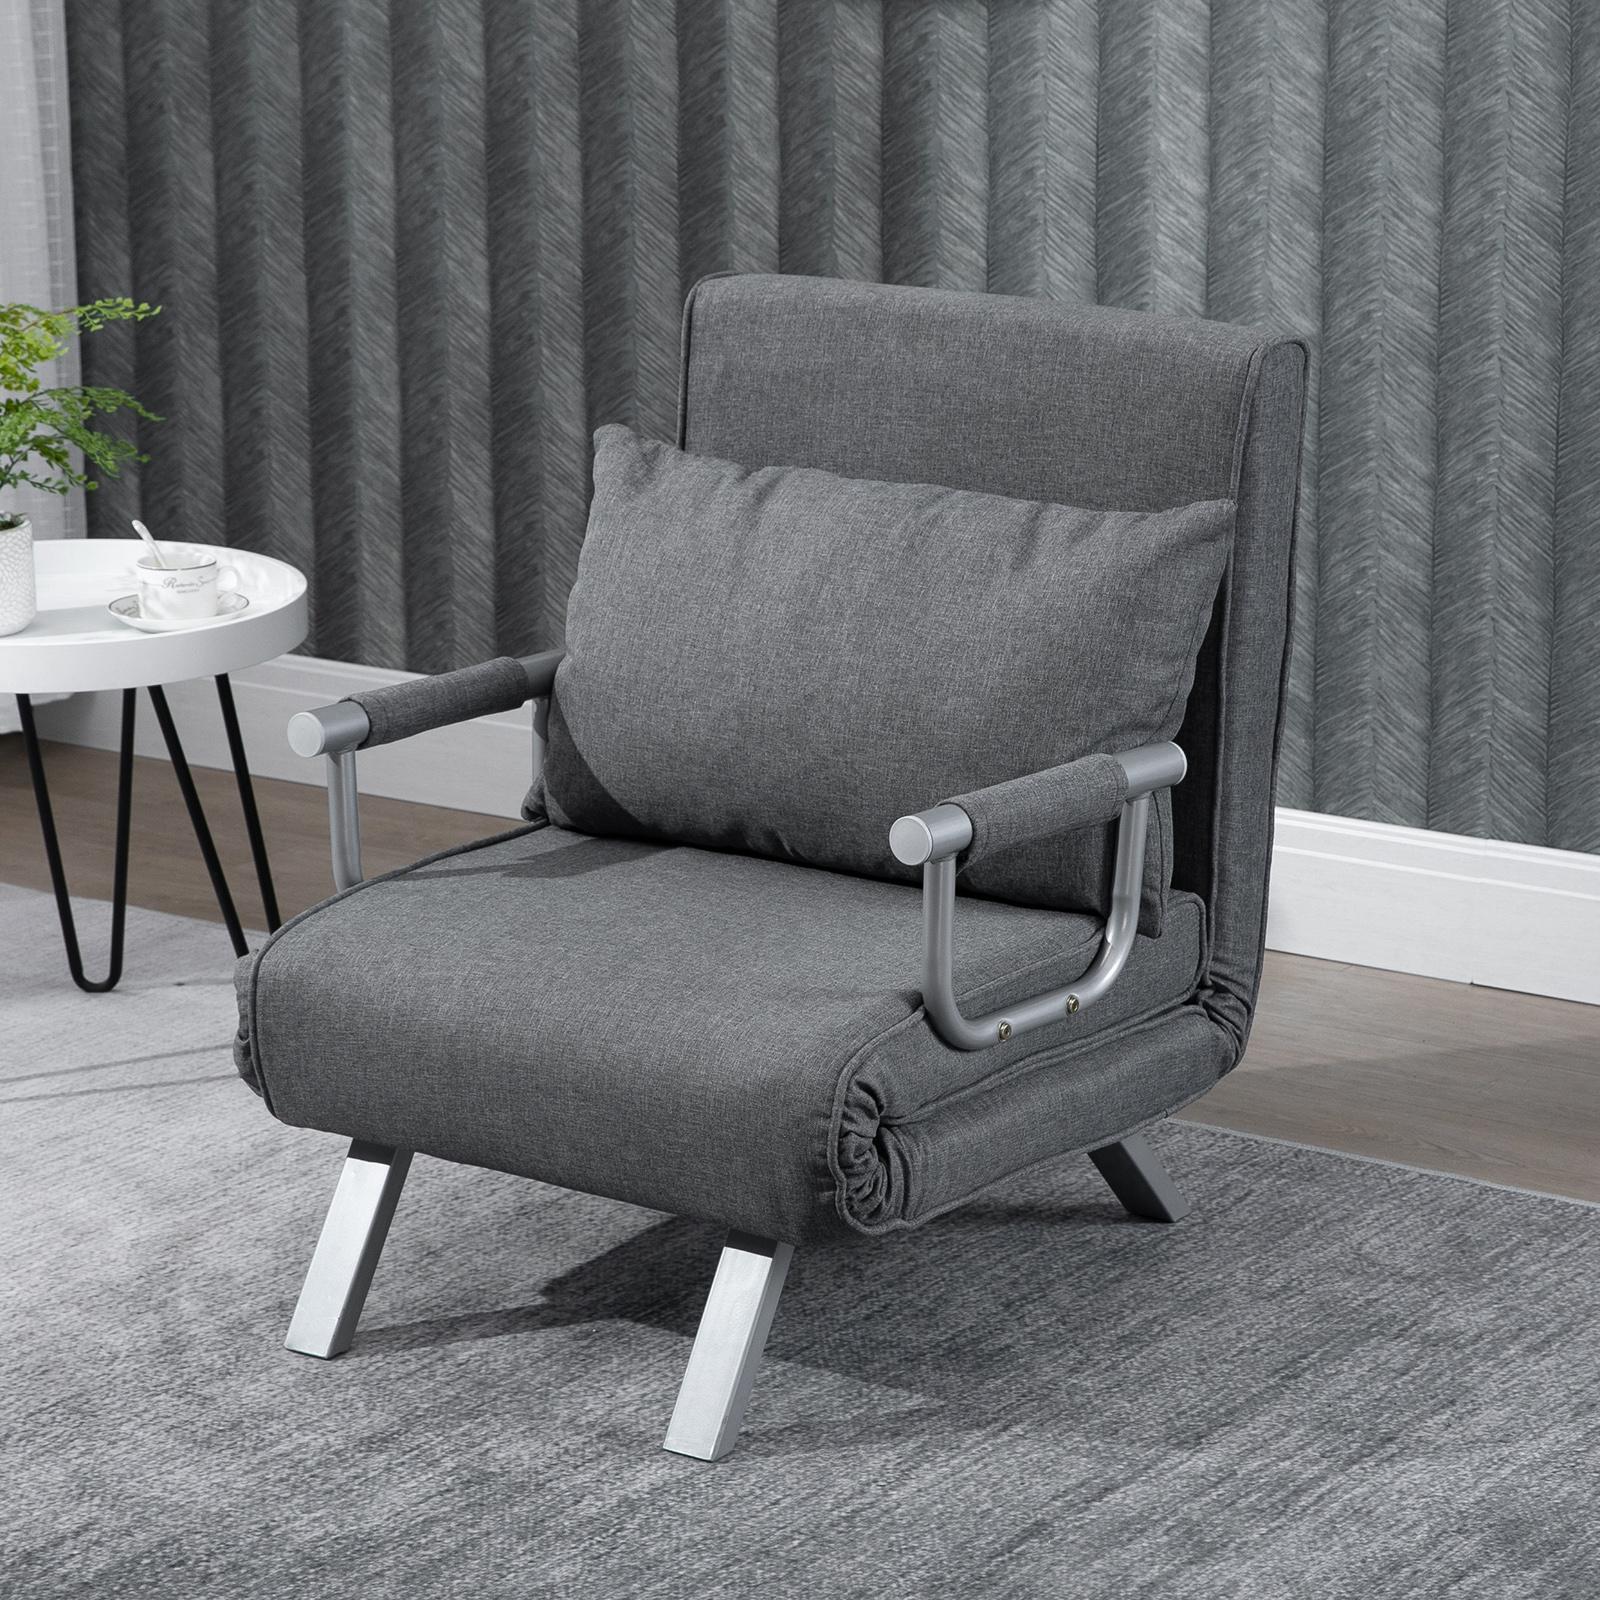 homcom fauteuil convertible canapé-lit convertible 1 place